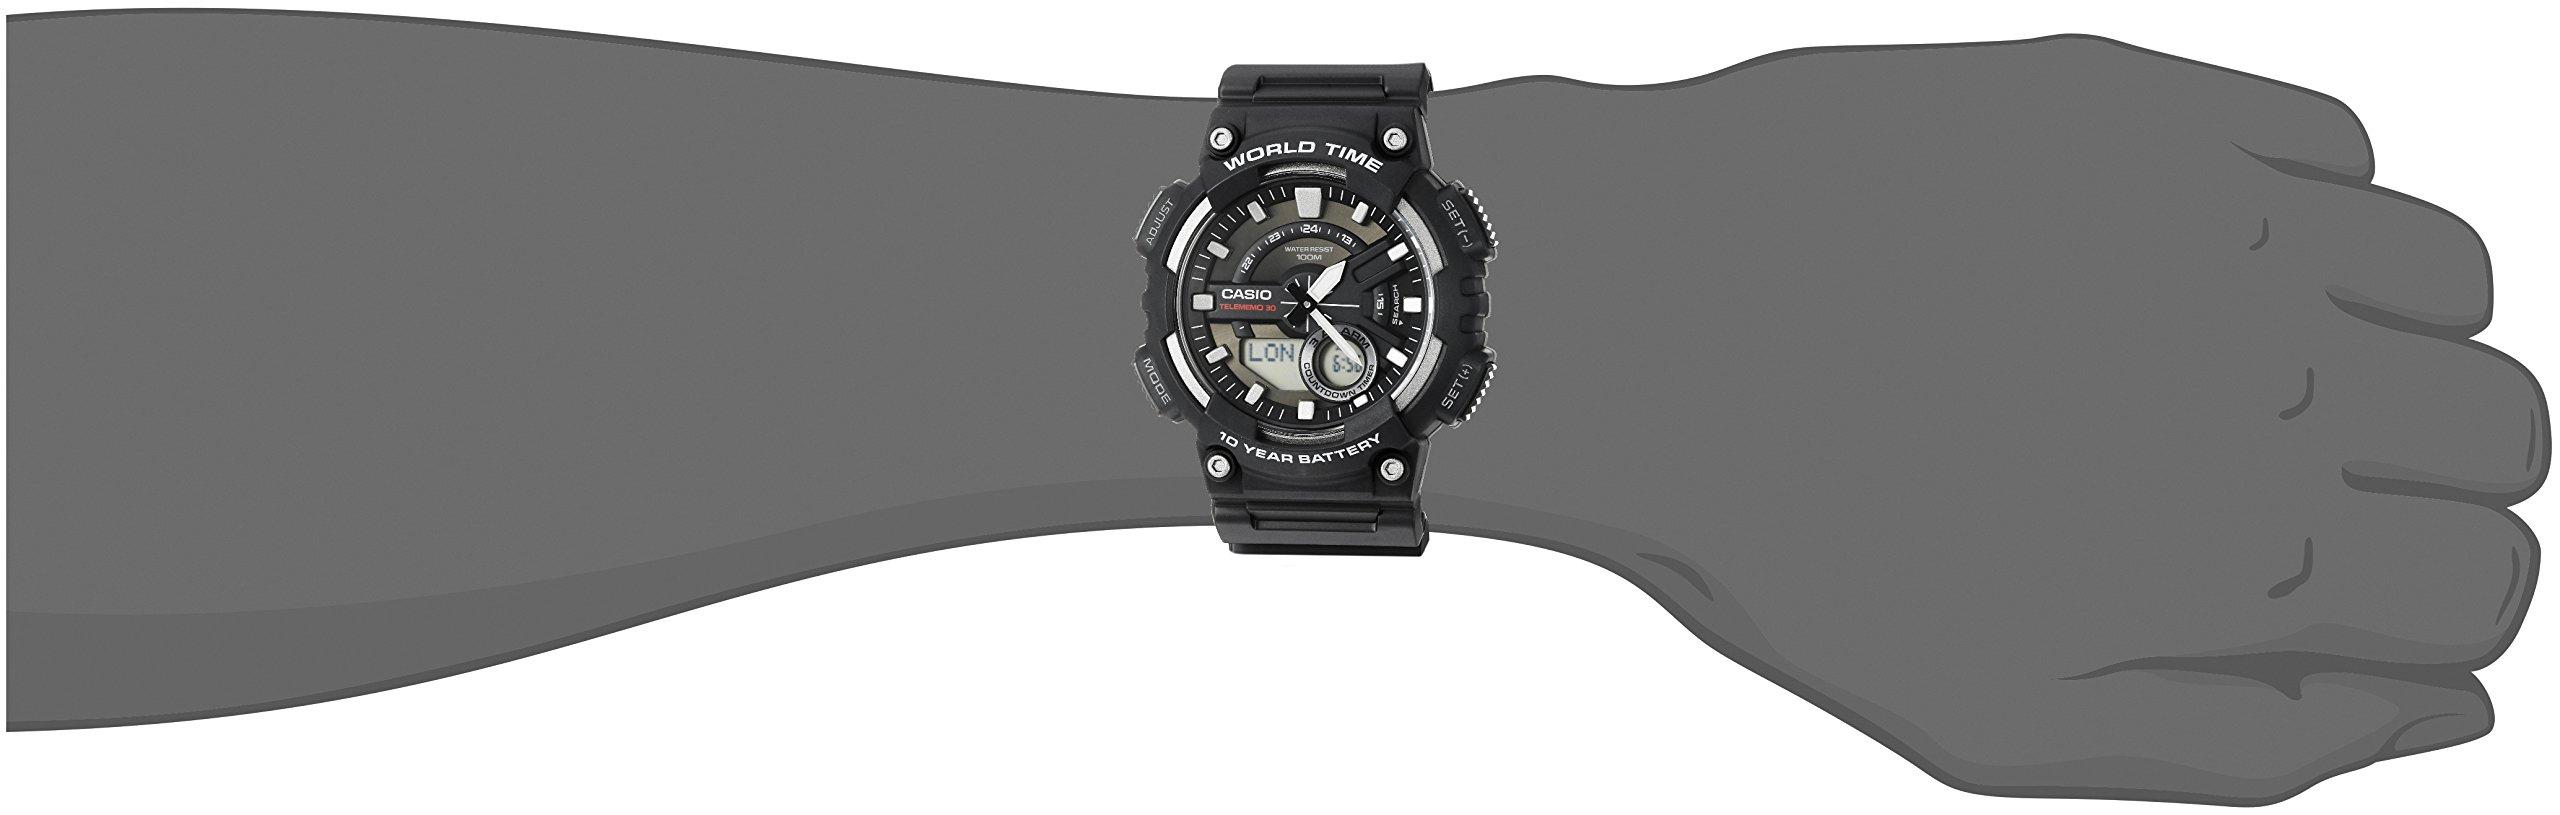 Casio Men's Sports Quartz Watch with Resin Strap, Black, 28.6 (Model: AEQ110W-1AV) by Casio (Image #2)